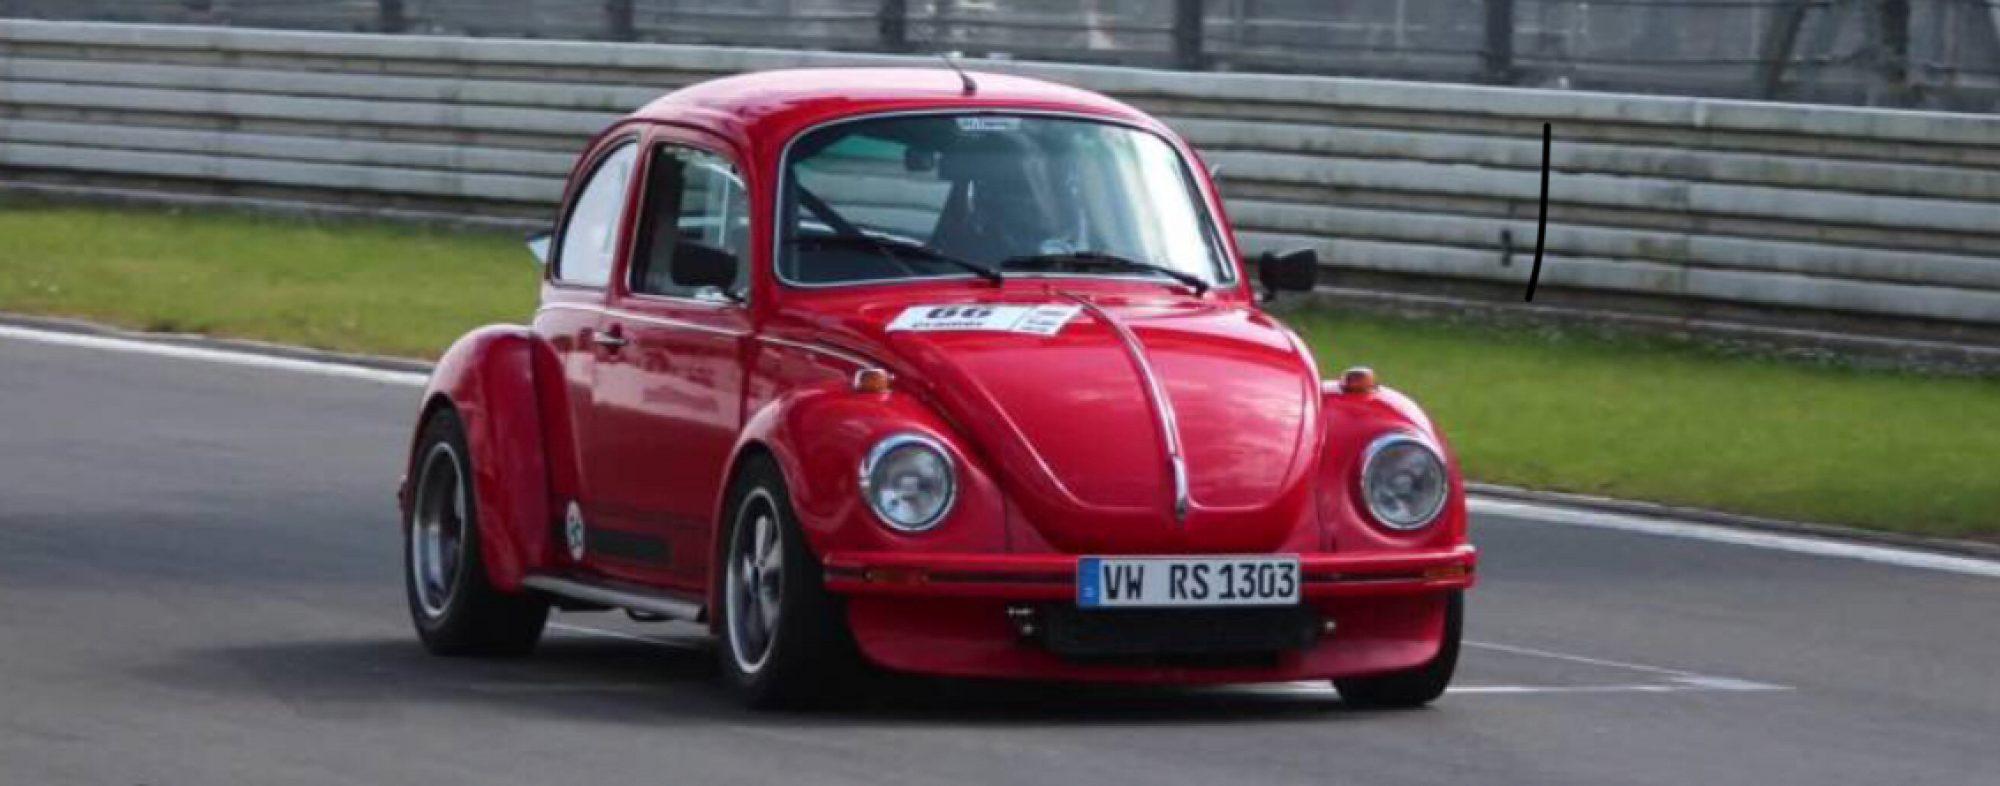 motorsport-kaefer.de